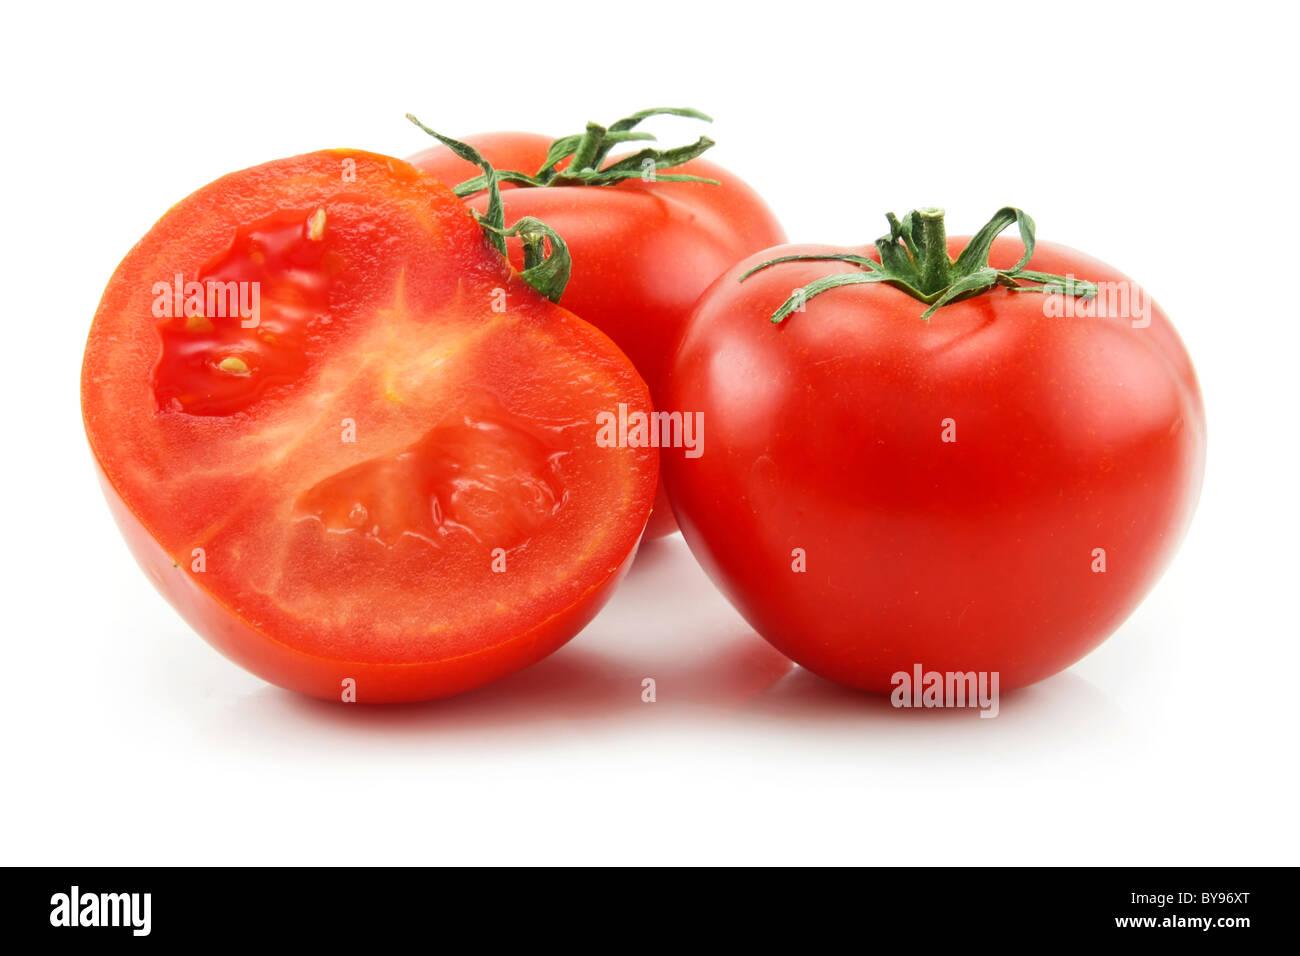 Ripe Sliced Tomatoes Isolated on White - Stock Image